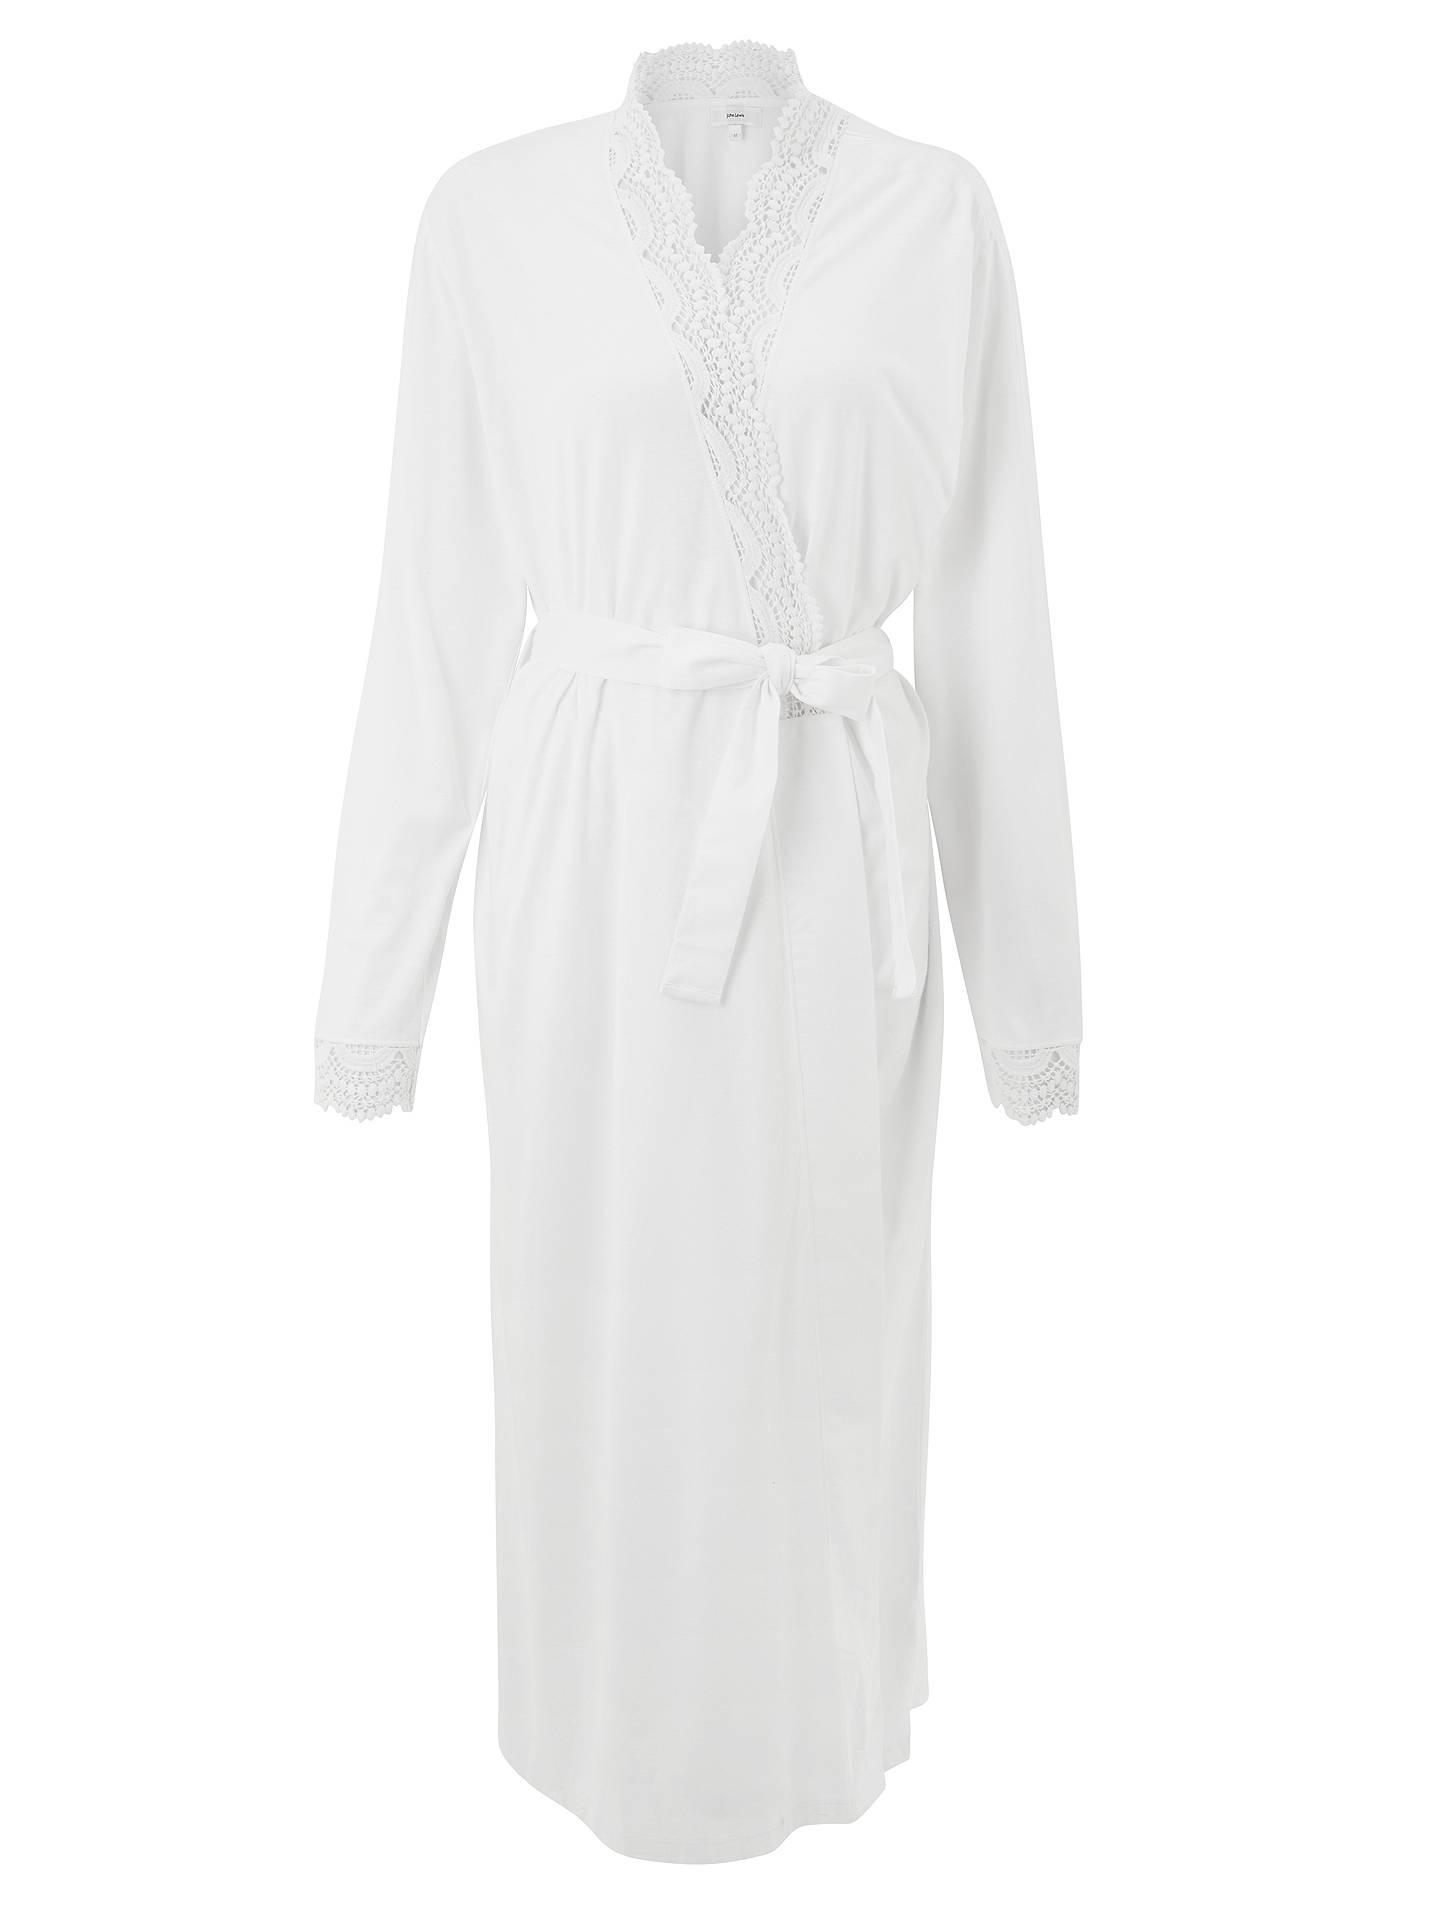 John Lewis Partners Lace Trim Jersey Dressing Gown White At John